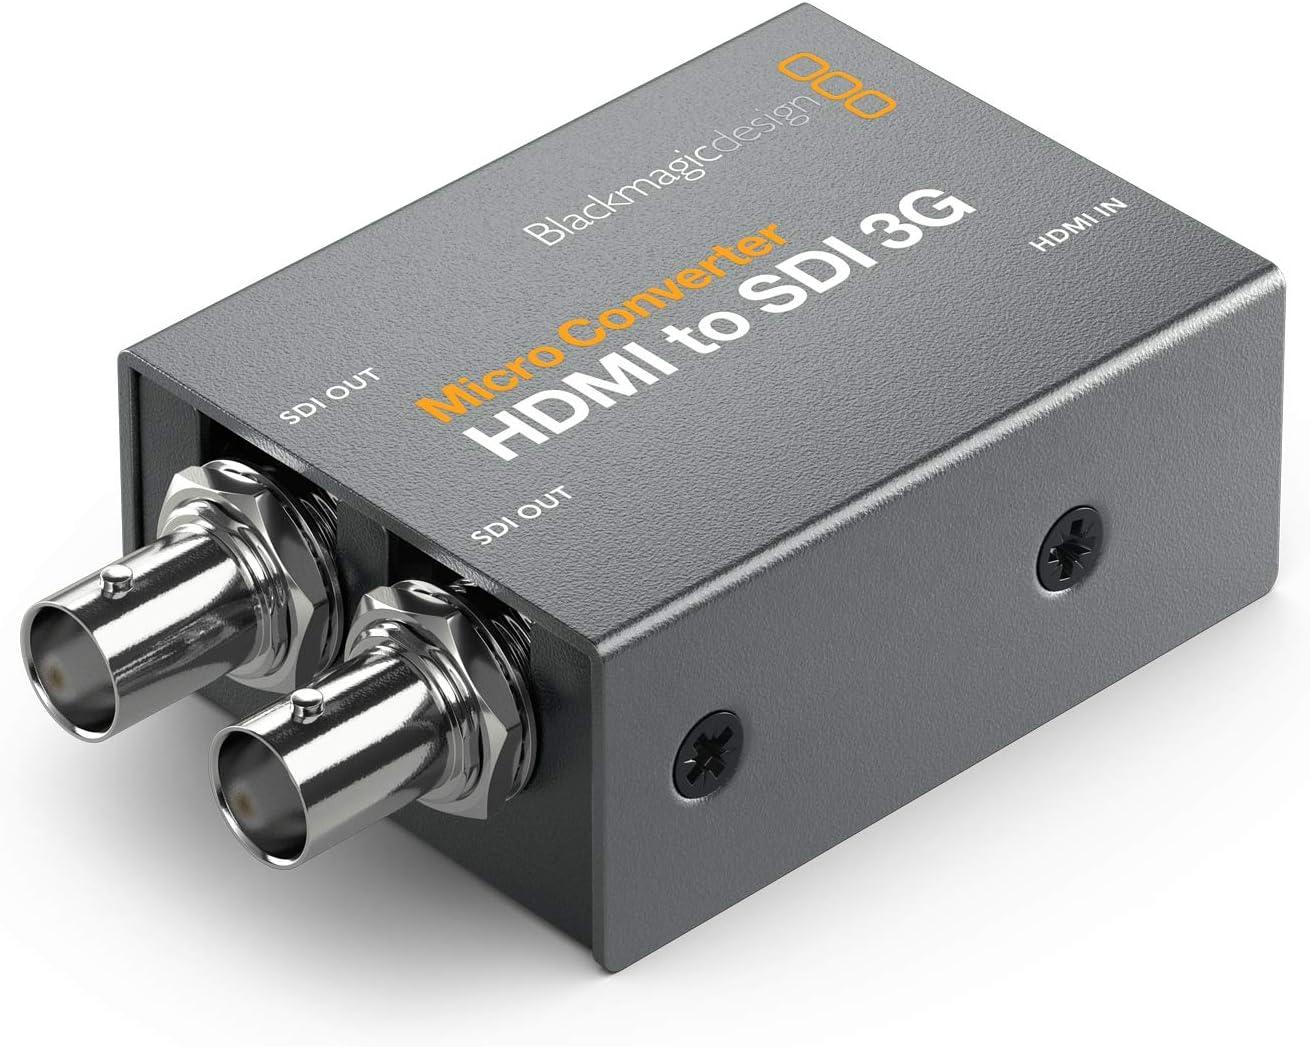 CONVCMIC//HS03G//WPSU avec Alimentation Blackmagic Convertisseur Micro Converter HDMI to SDI 3G wPSU